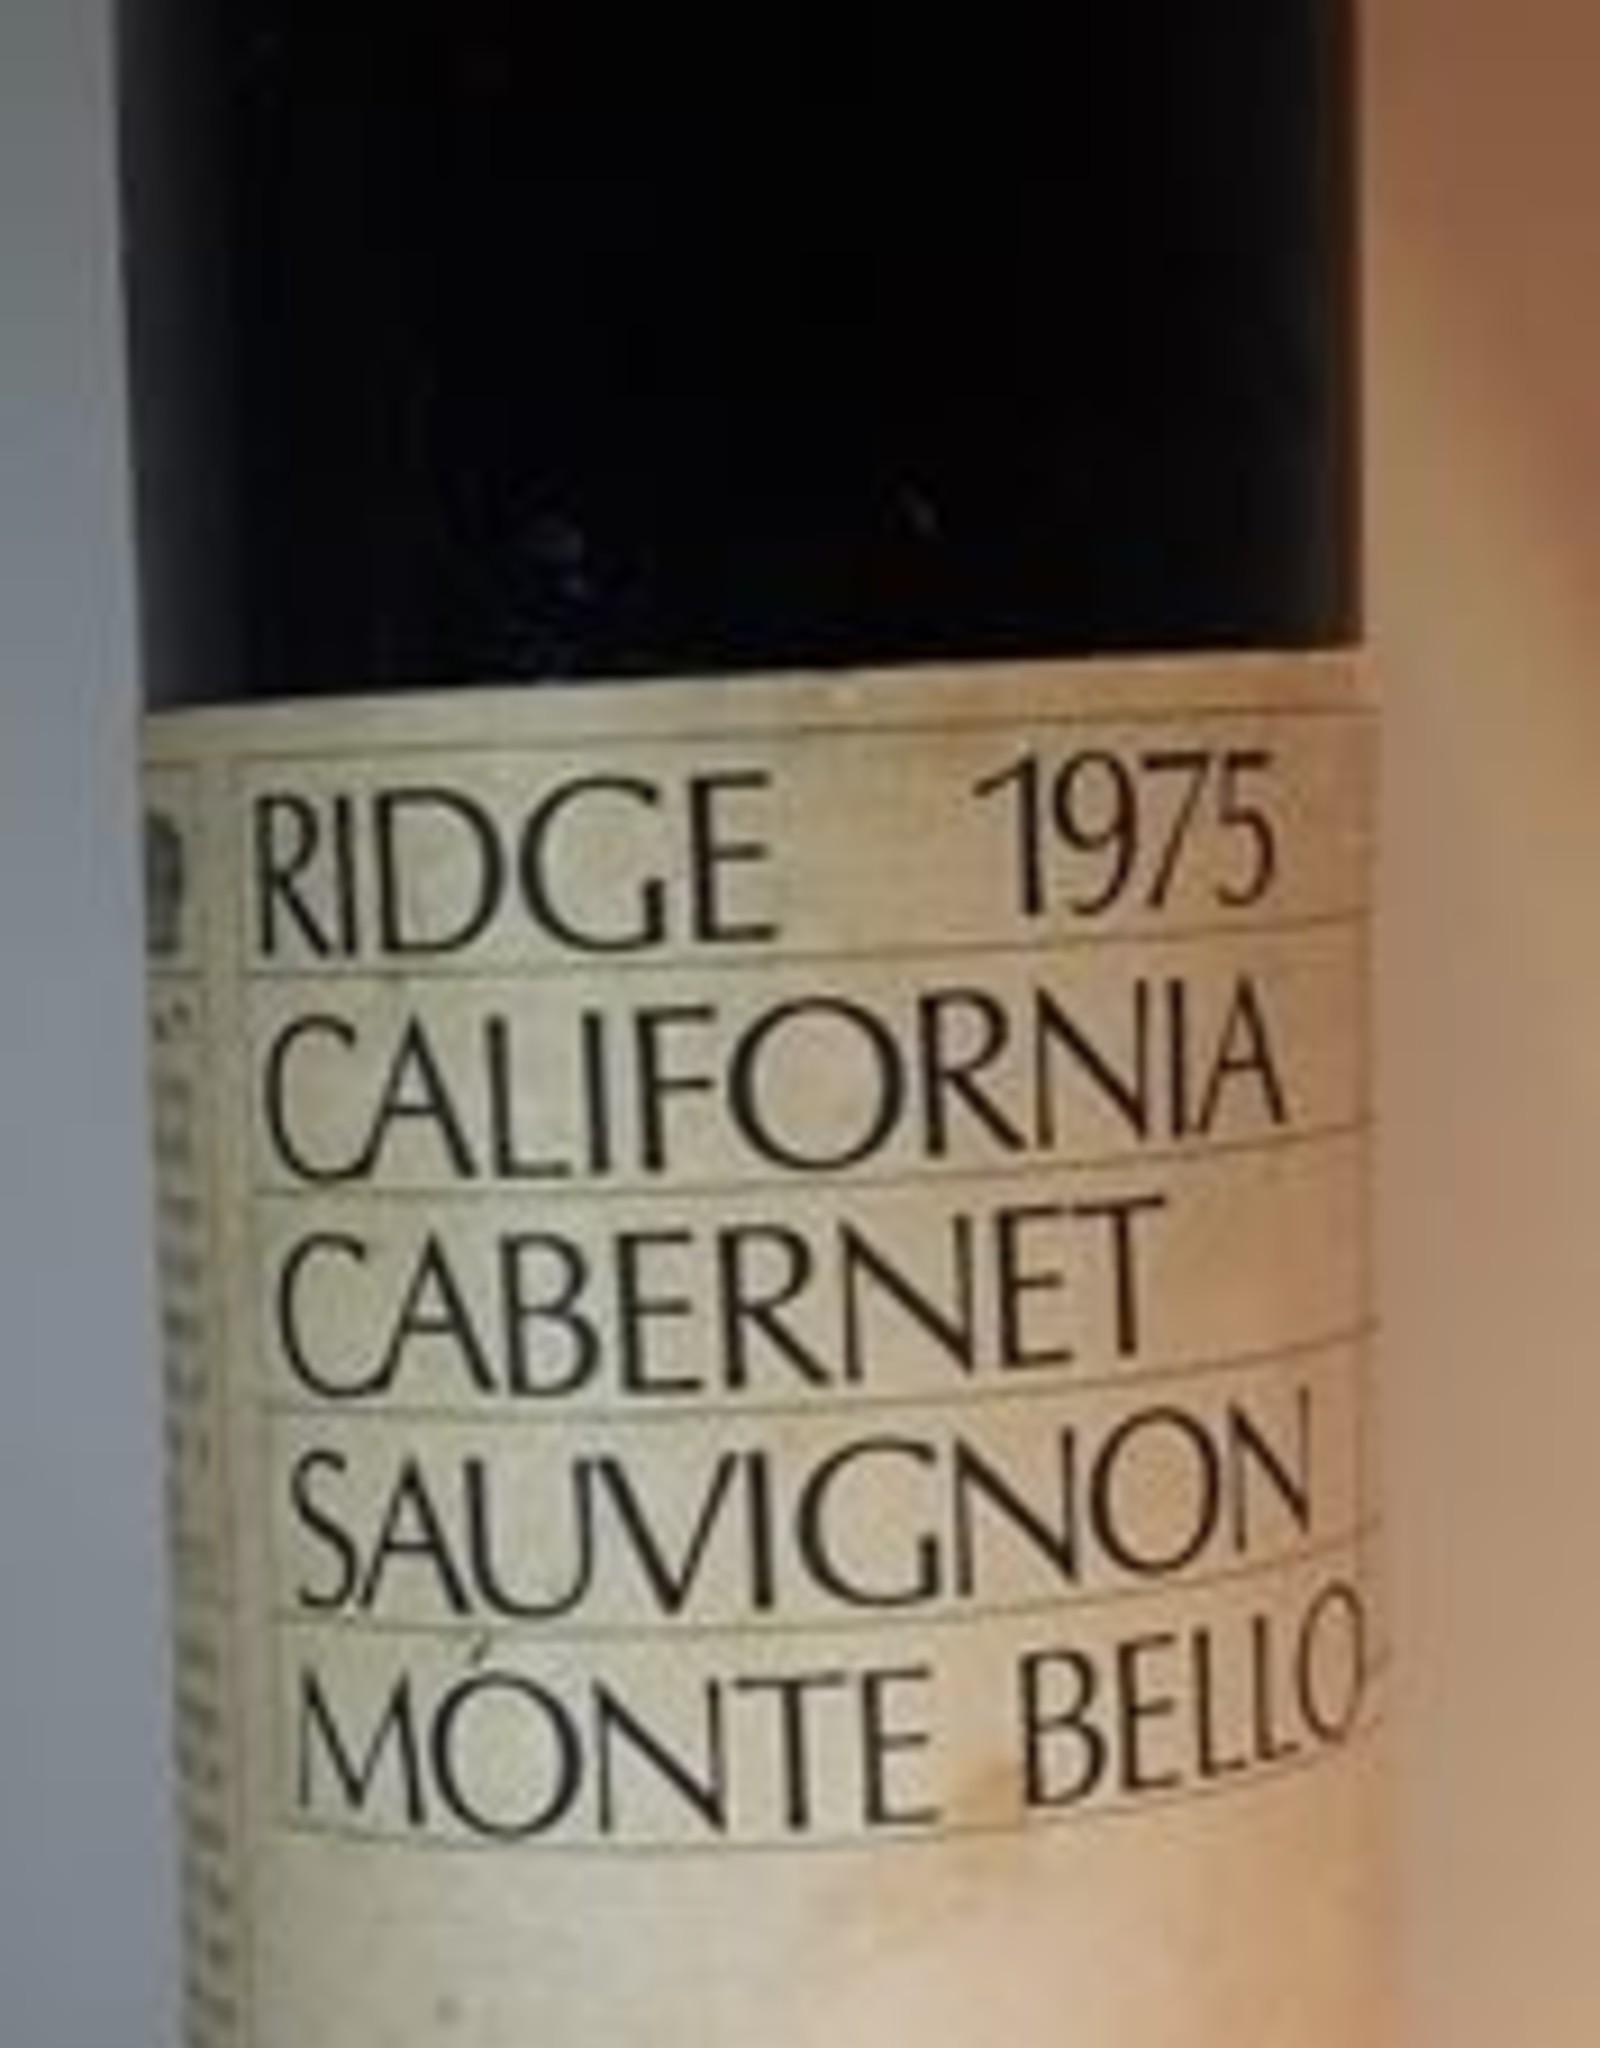 Ridge Cabernet 1975 Monte Bello